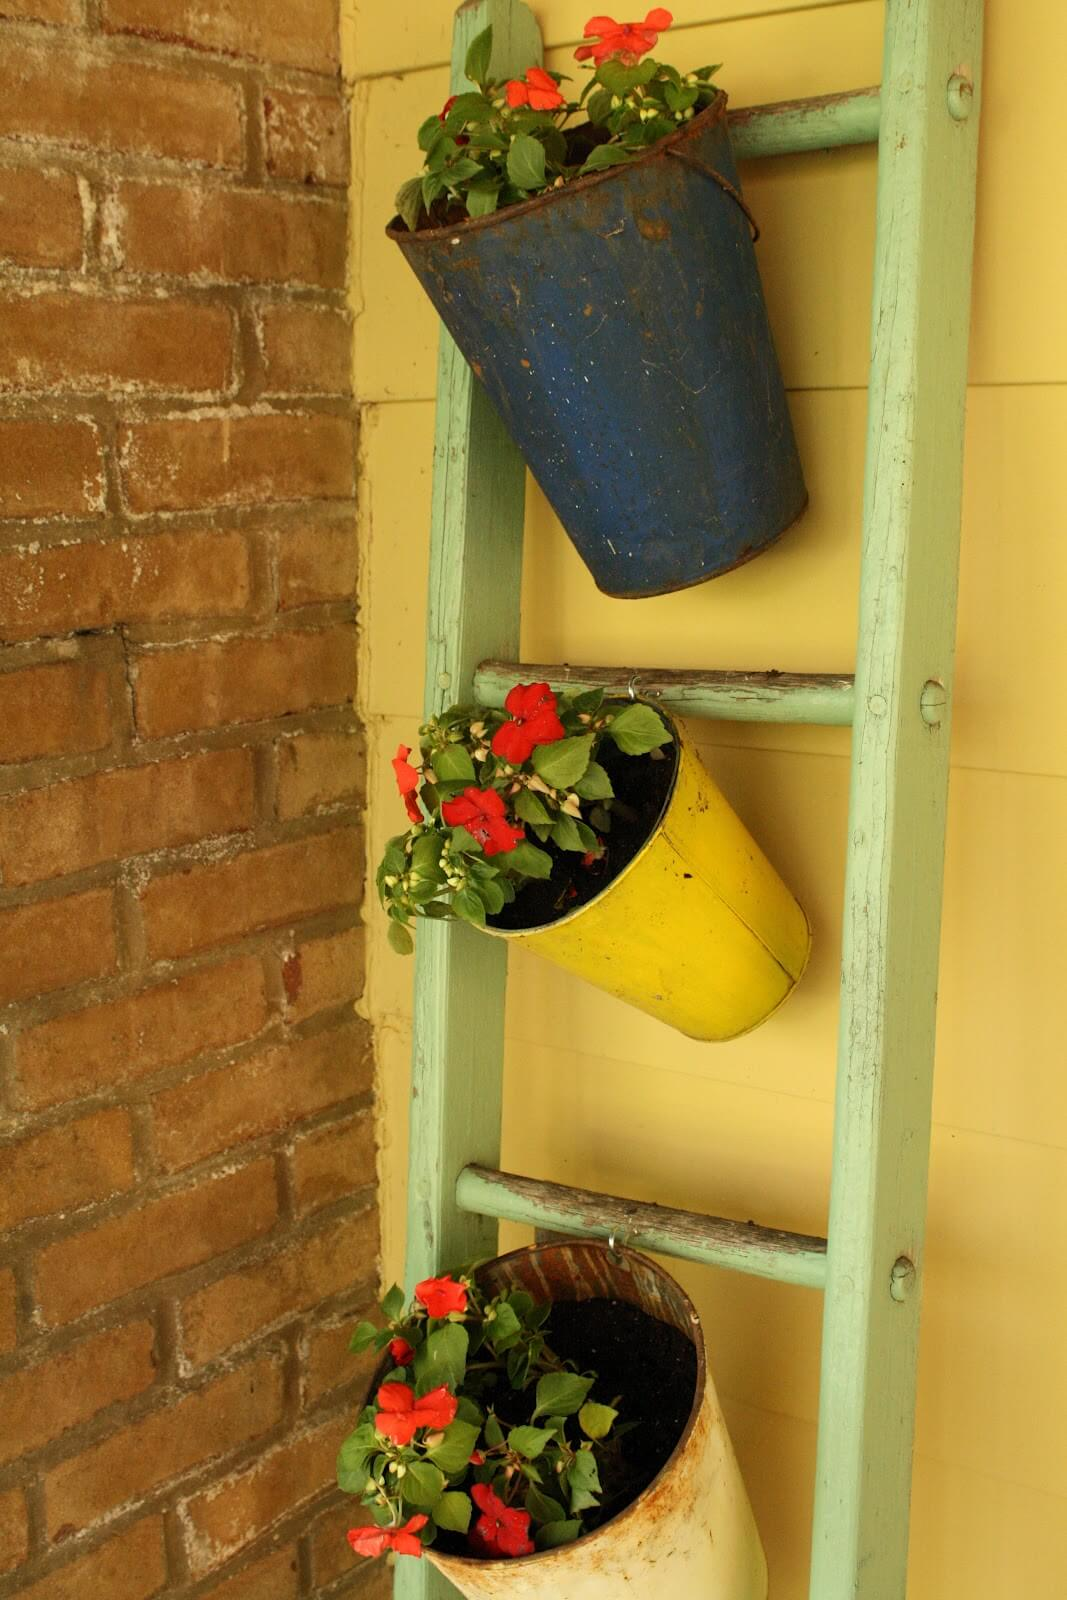 Outdoor Leaning Ladder Flowerpot Holder